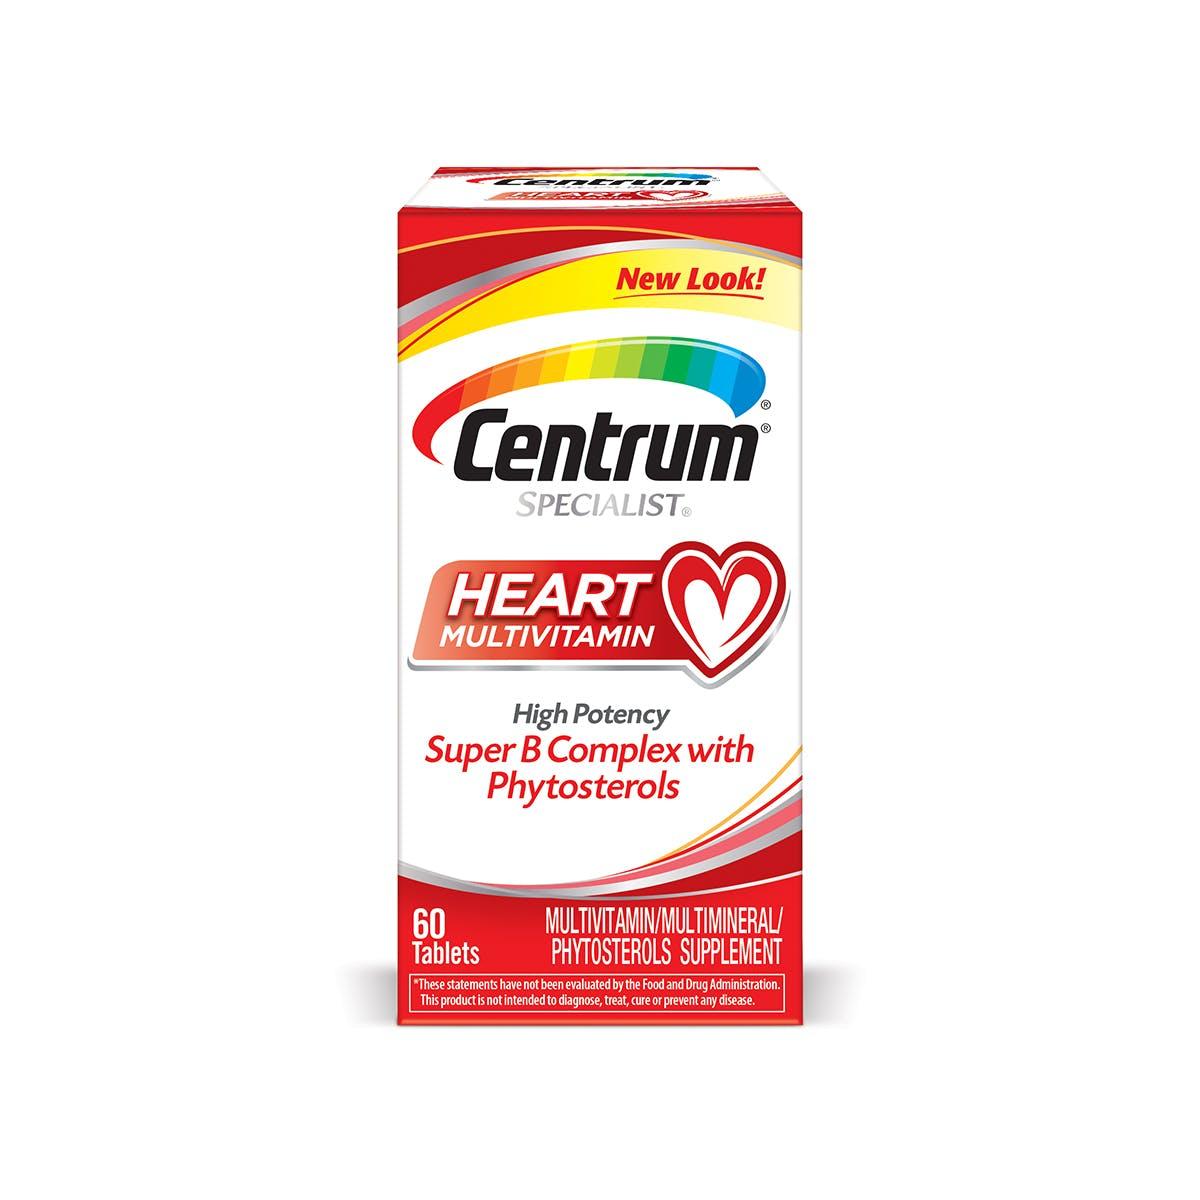 Box of centrum specialist heart multivitamins